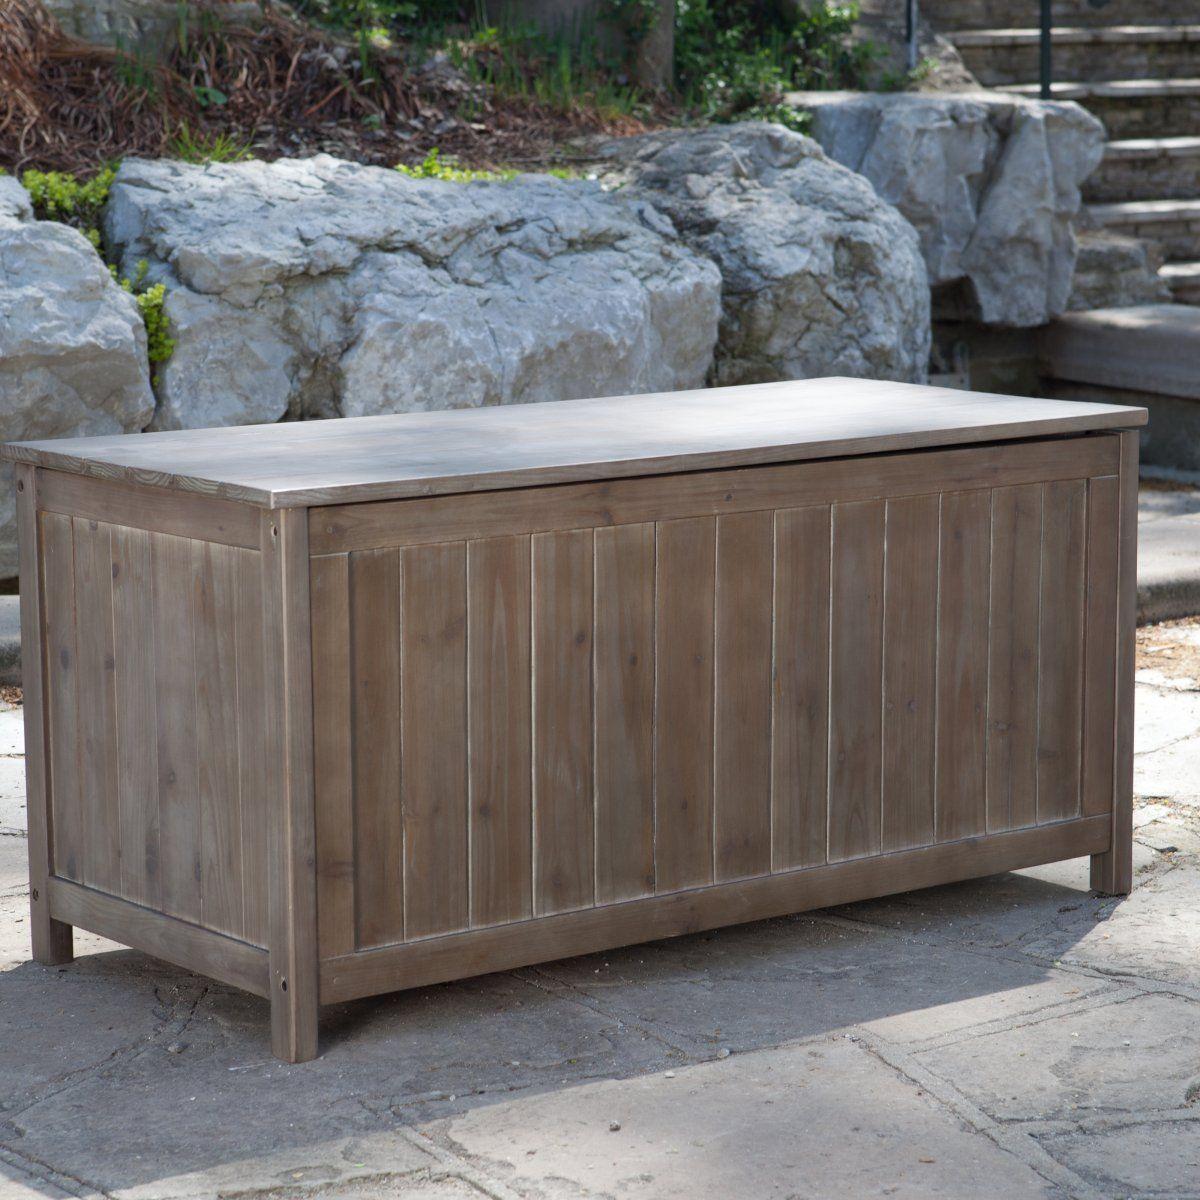 Gardeners Choice Deck Storage Box   Antique Grey   Outdoor Benches At  Hayneedle